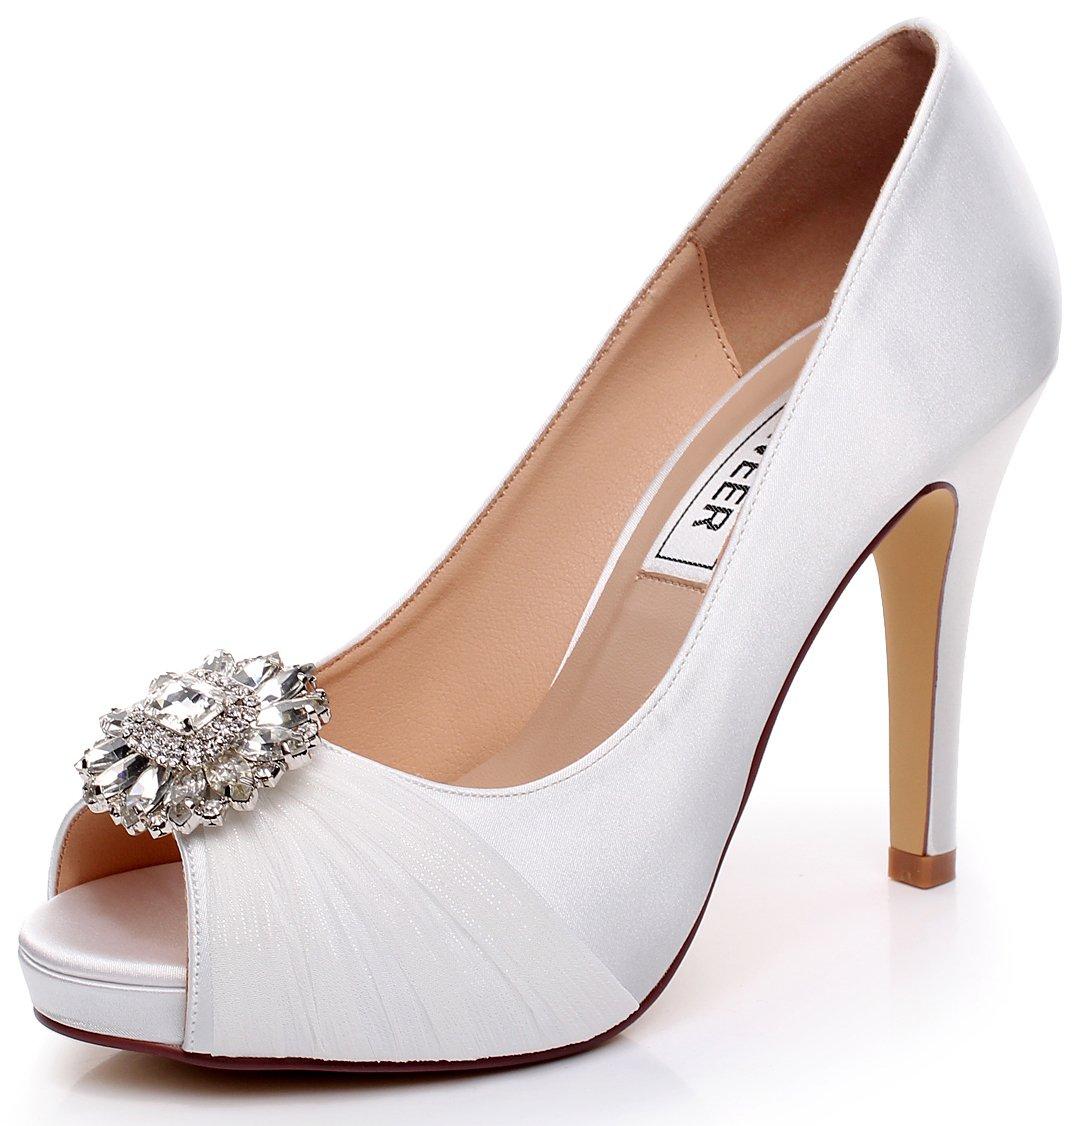 LUXVEER White Satin women dress shoes pumps, High Heel 4.5inch-Peep Toe-EUR42